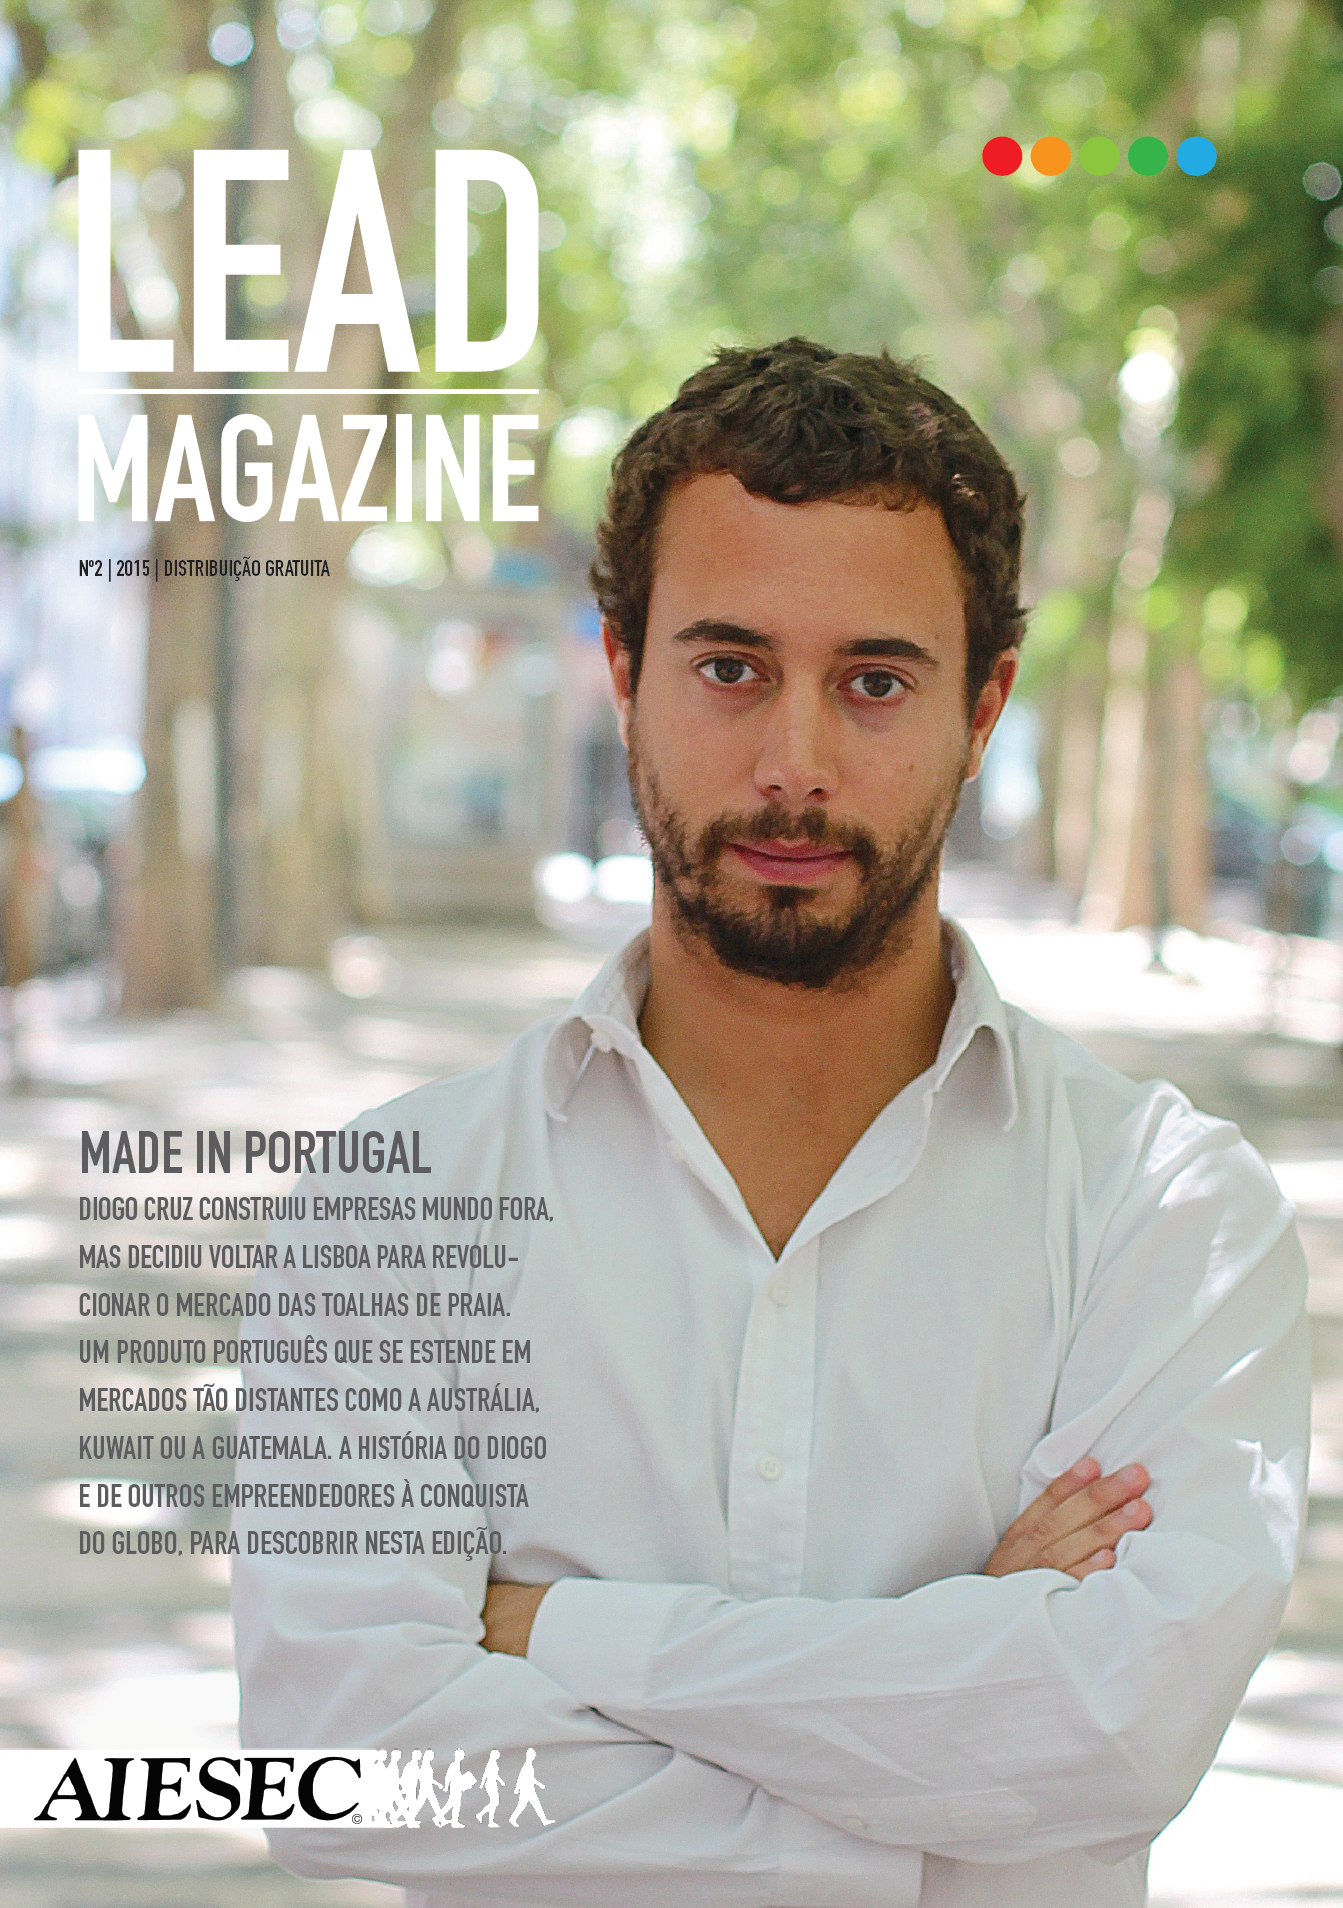 Lead Magazine 2